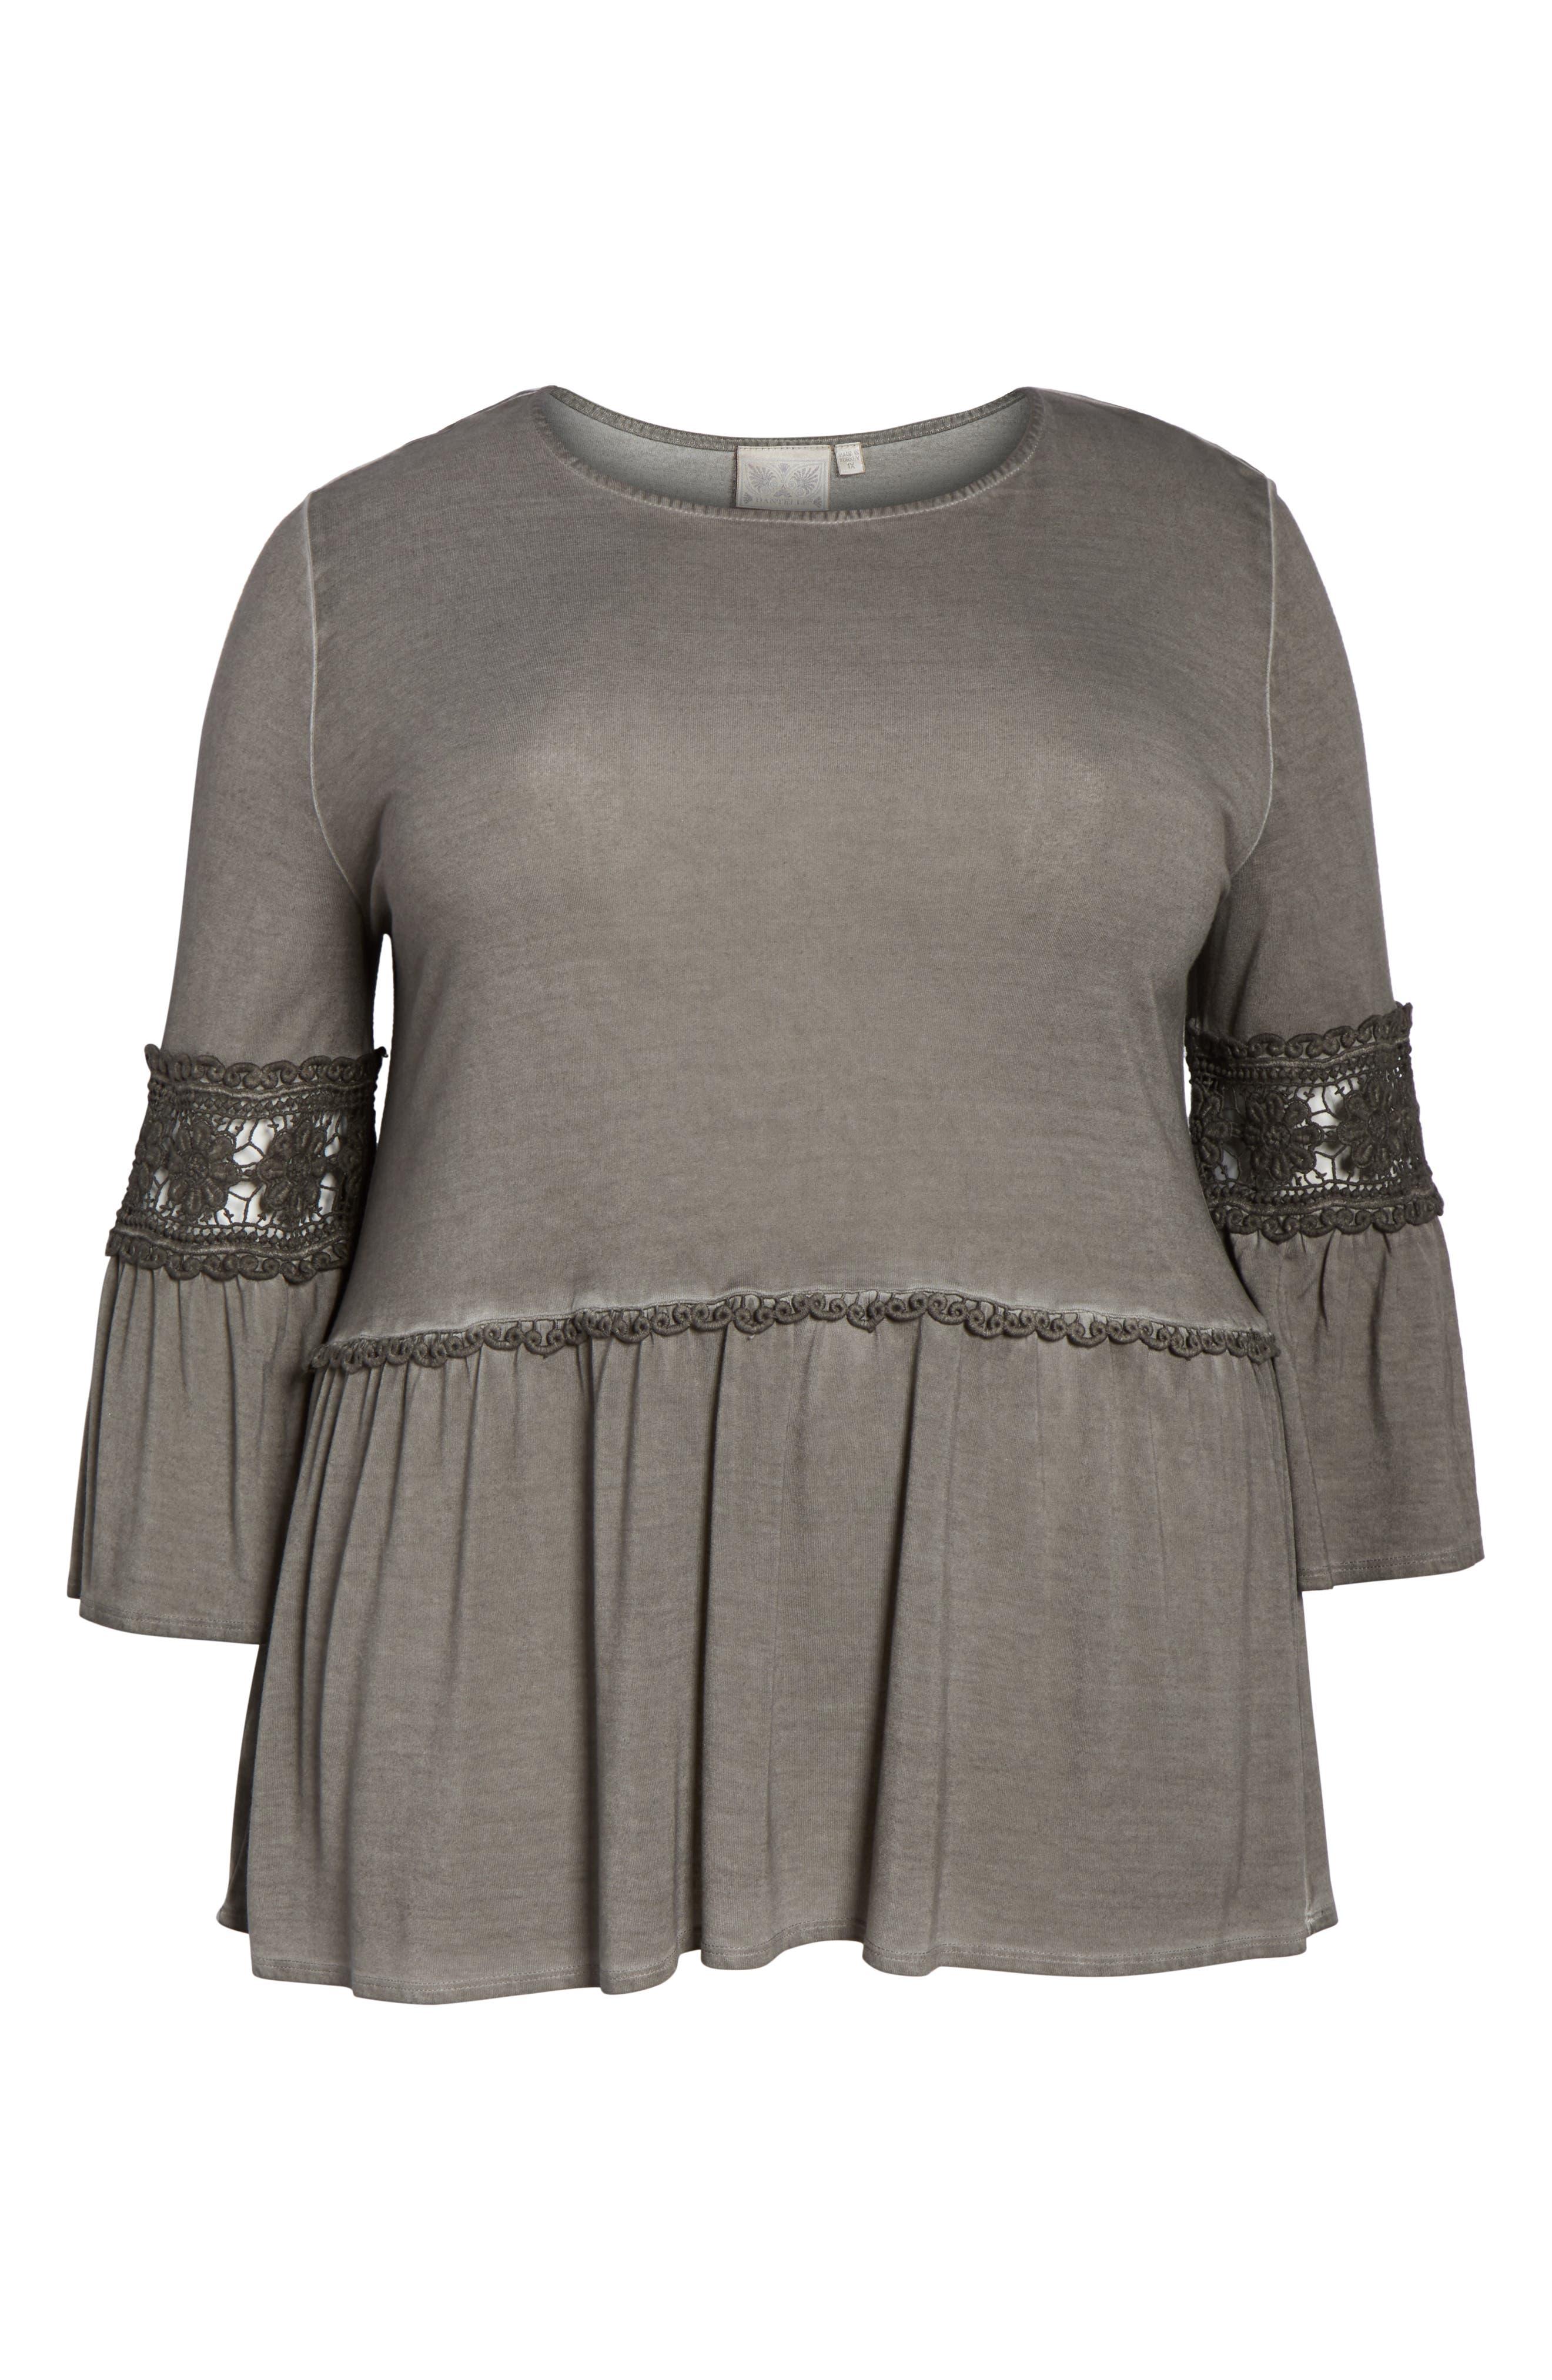 DANTELLE,                             Oil Dye Knit Lace Inset Top,                             Alternate thumbnail 6, color,                             FALCON